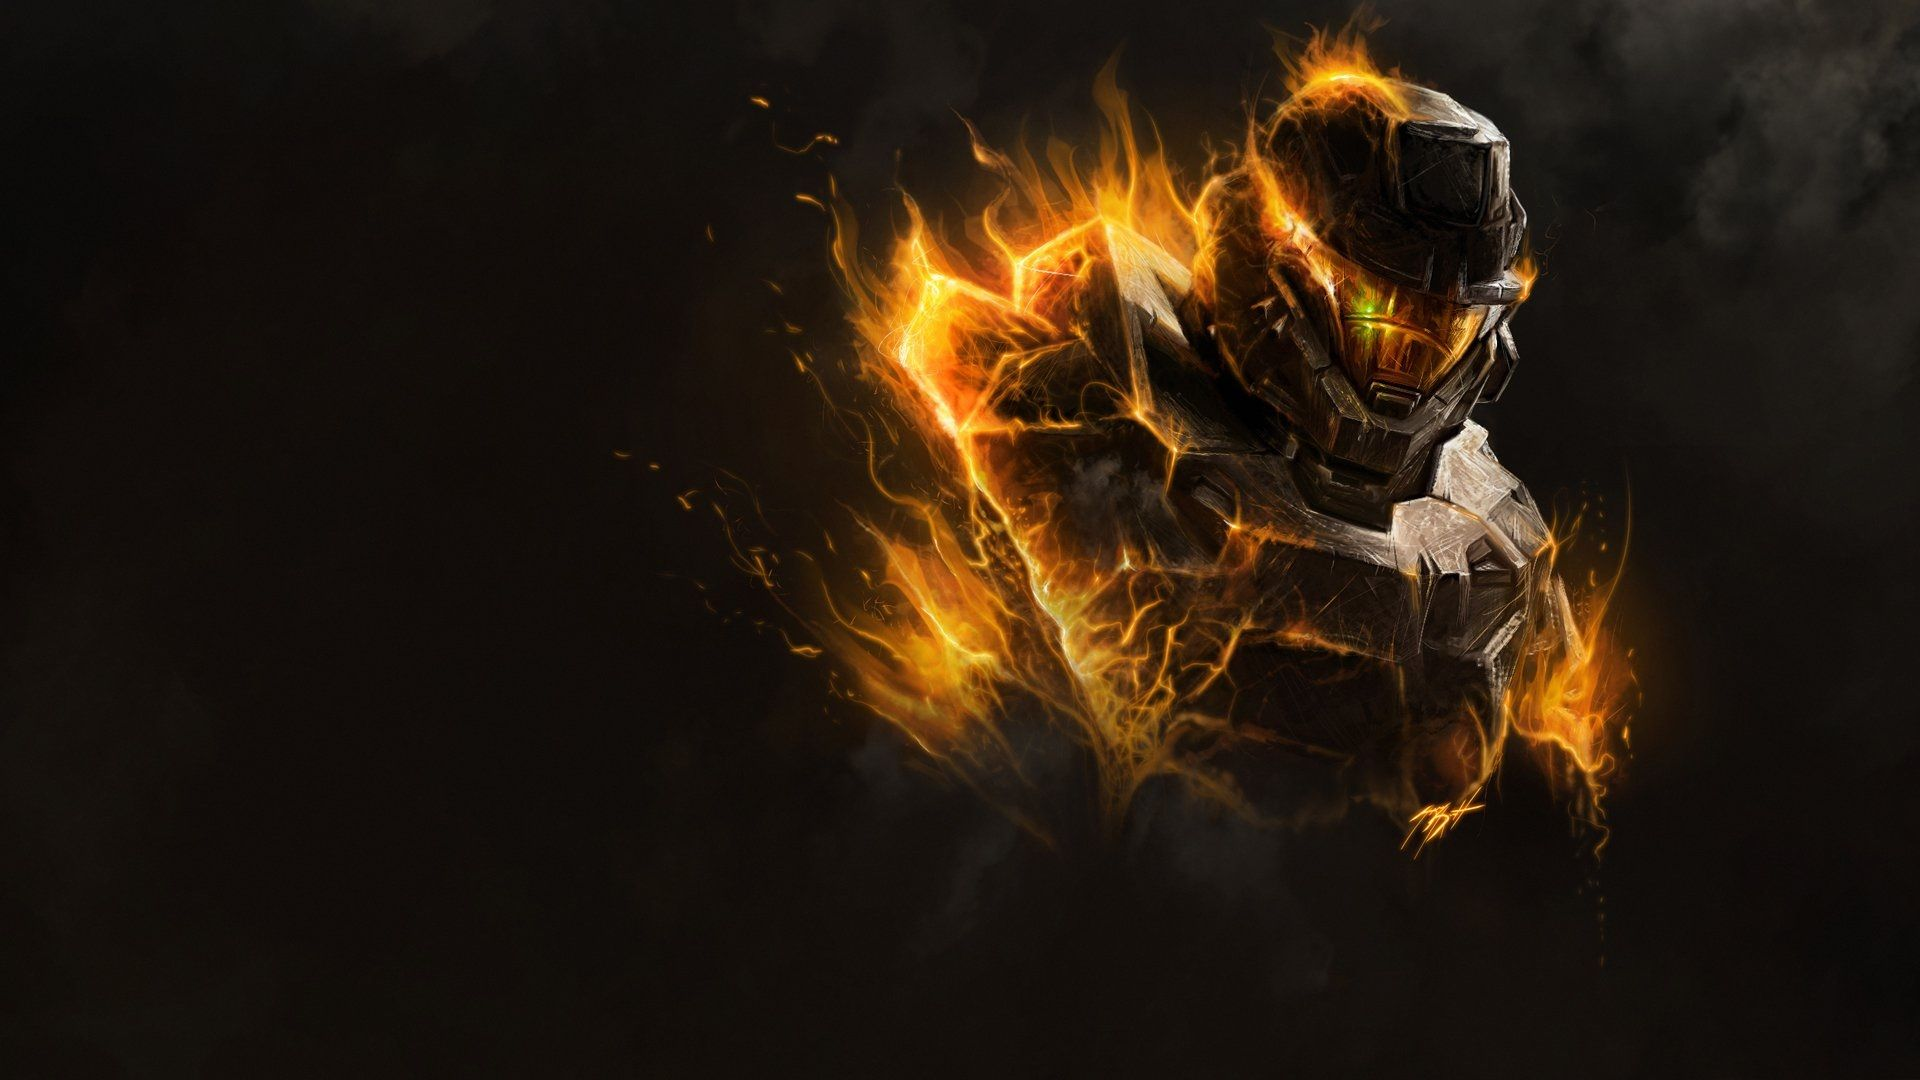 Master Chief Halo 5 Guardians Art Hd Wallpaper Halo Wallpaper